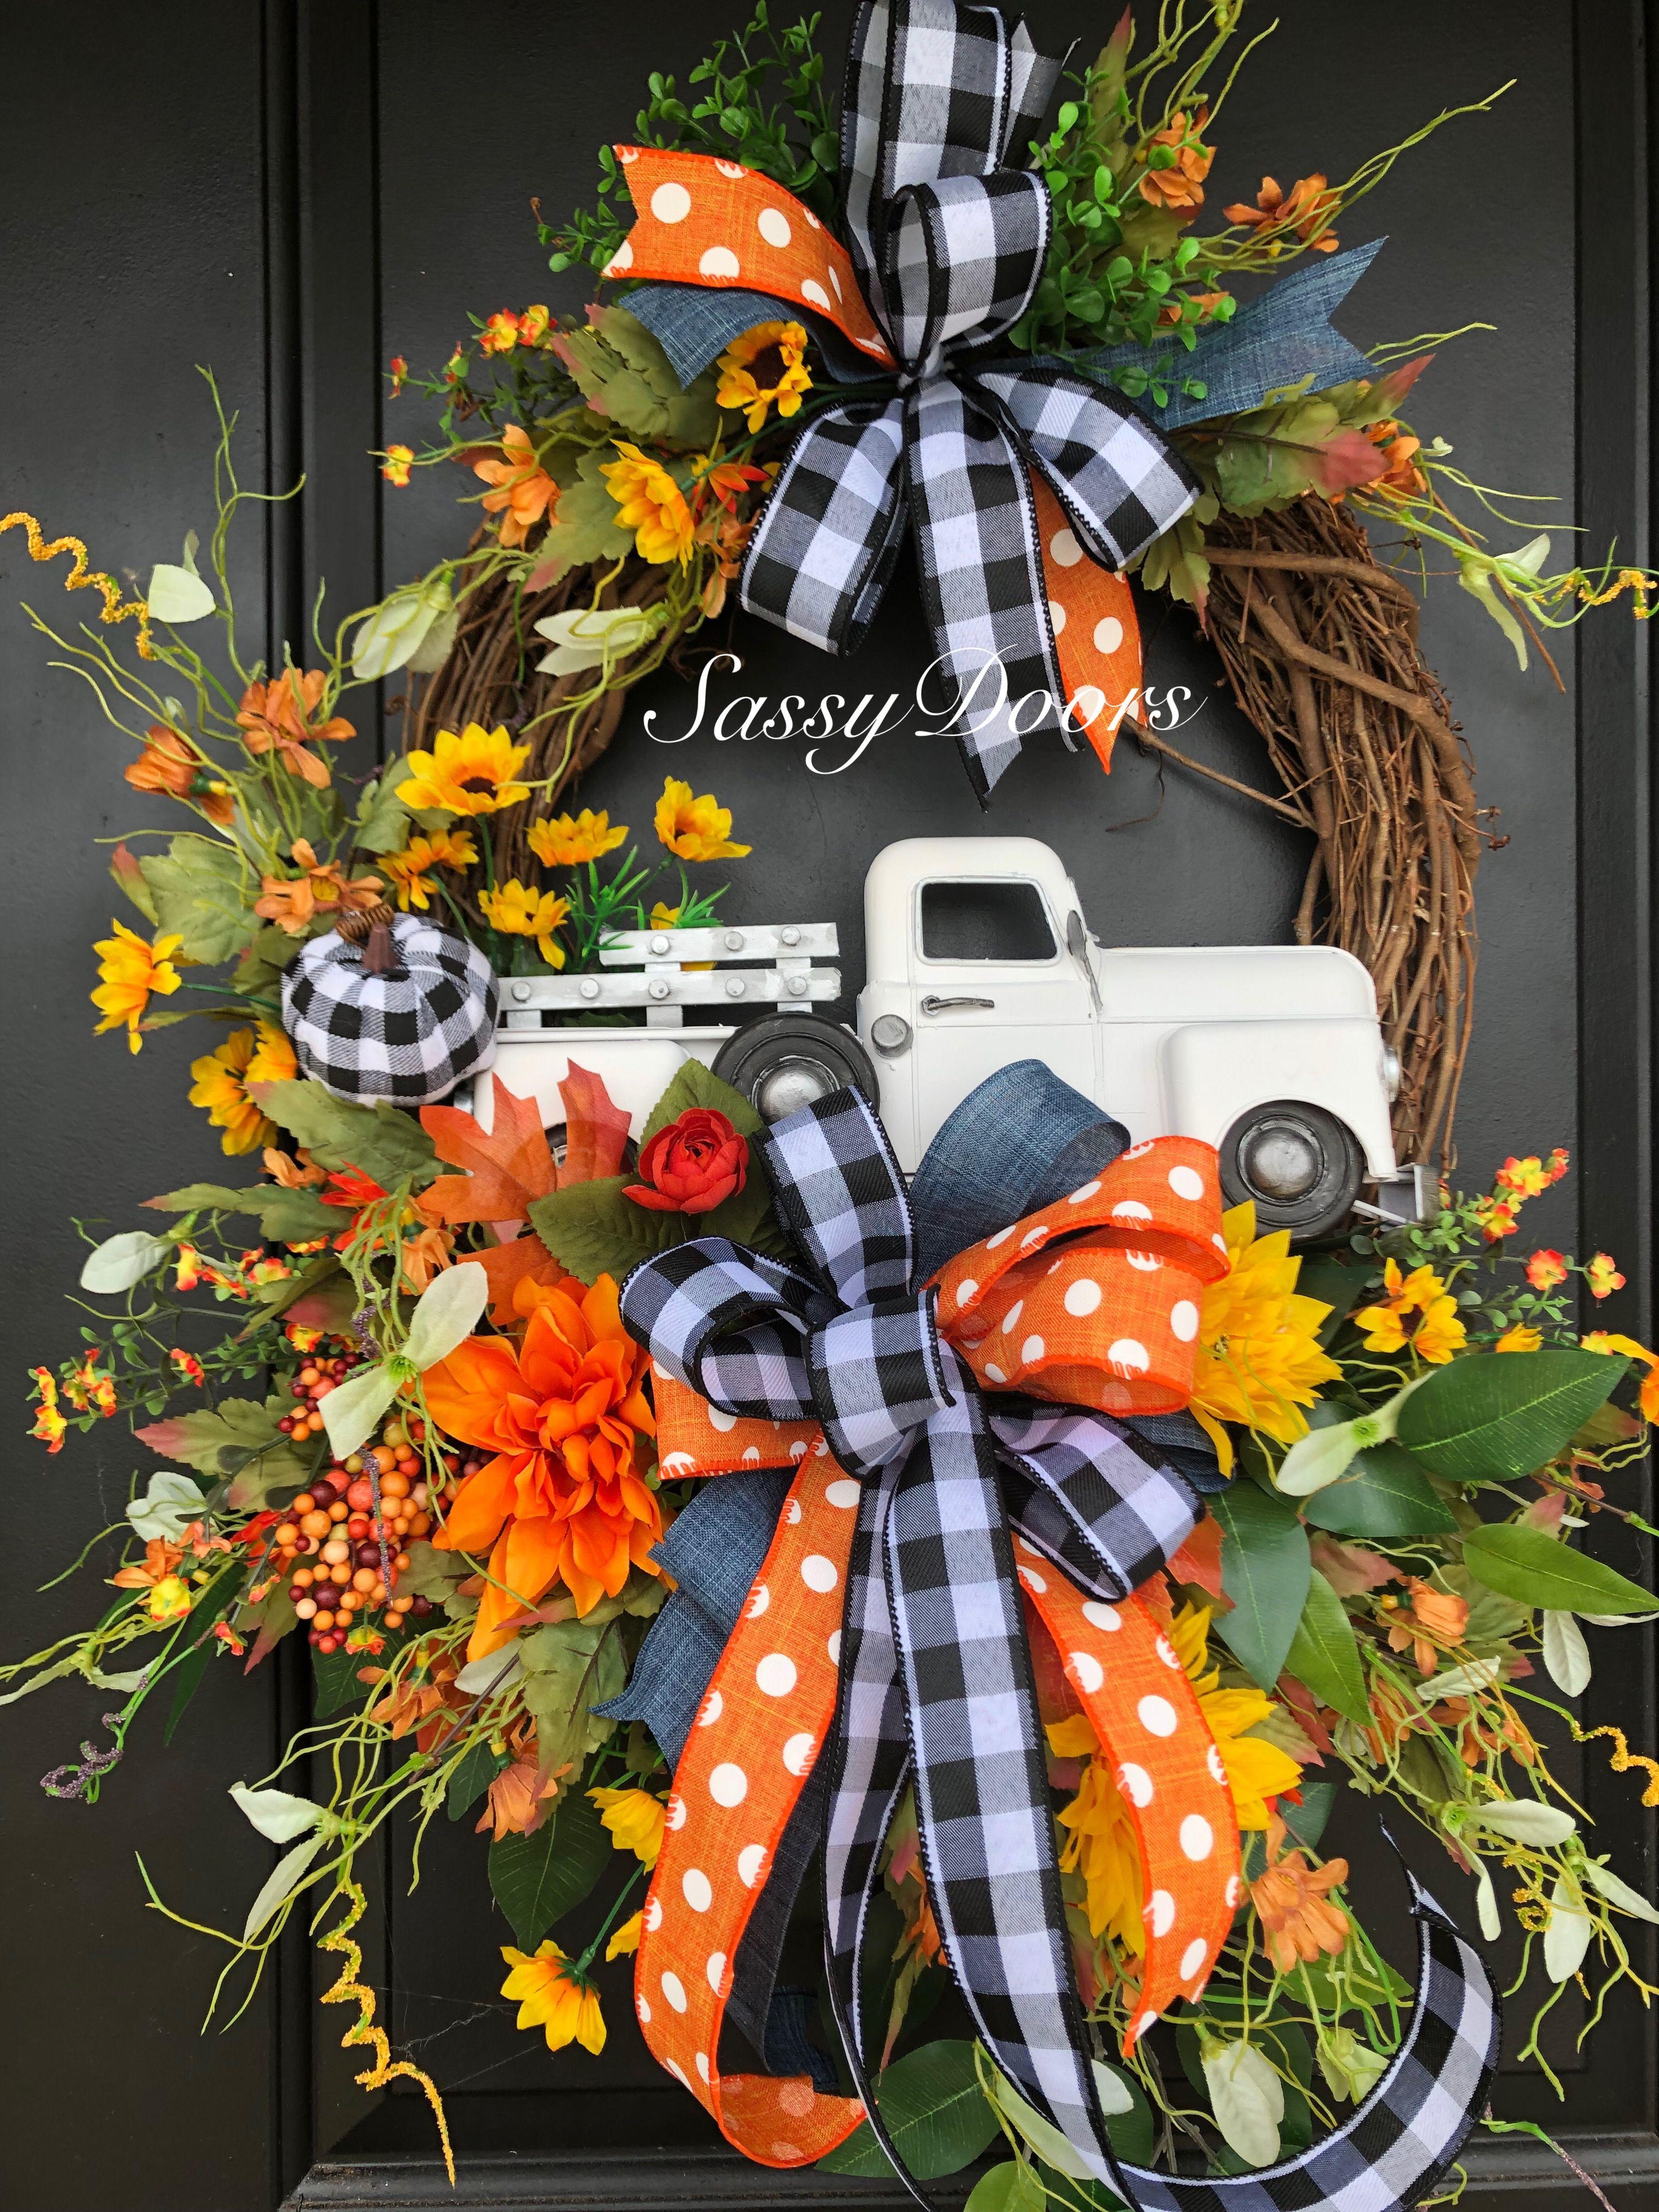 Leaf Wreath Red Truck D\u00e9cor Rustic Fall Wreath Autumn Home Decor Fall Pumpkin Wreath Vintage Truck Front Door Farmhouse Door